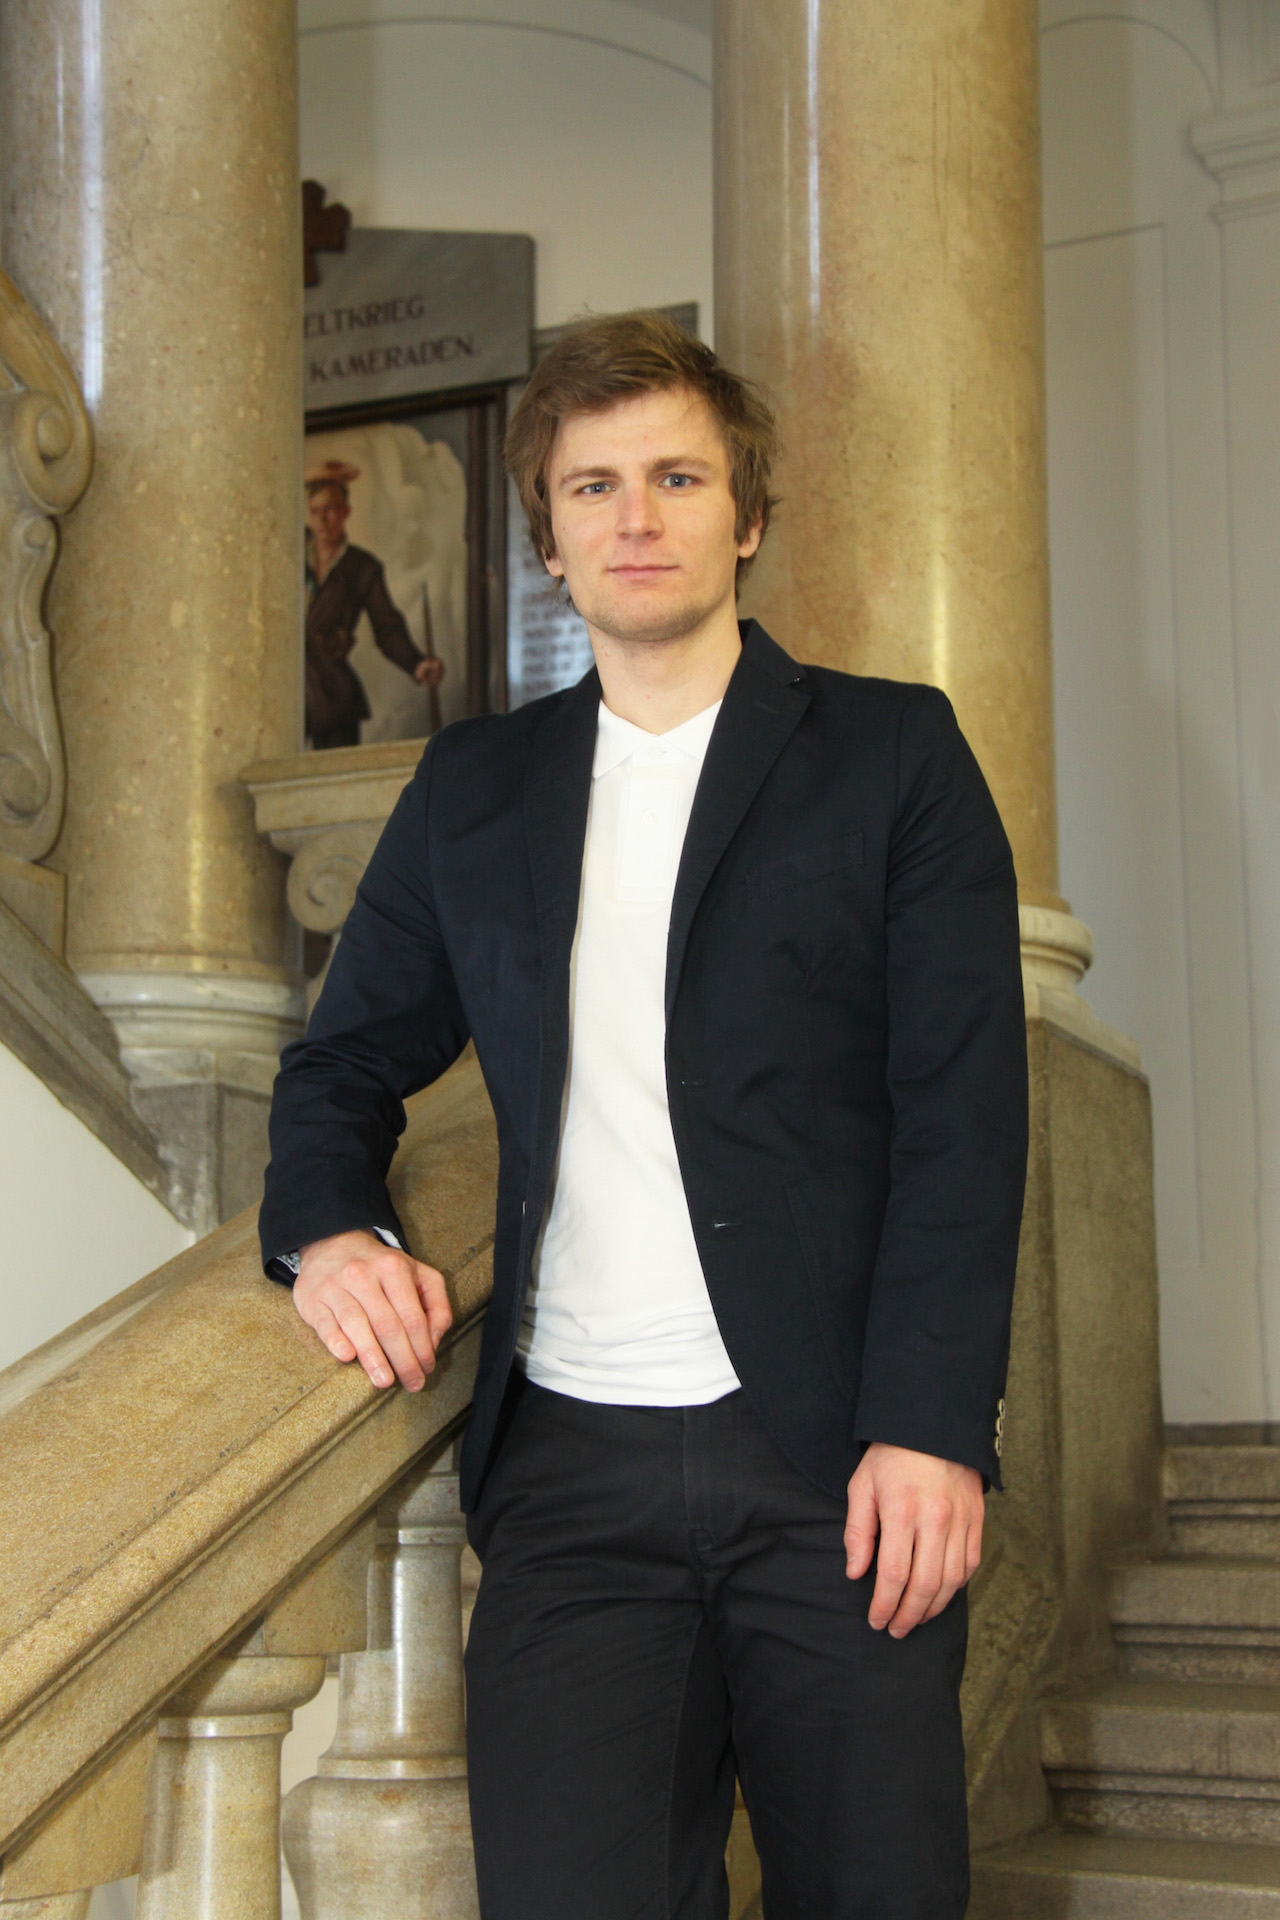 David Kutas - IT Officer Secretary